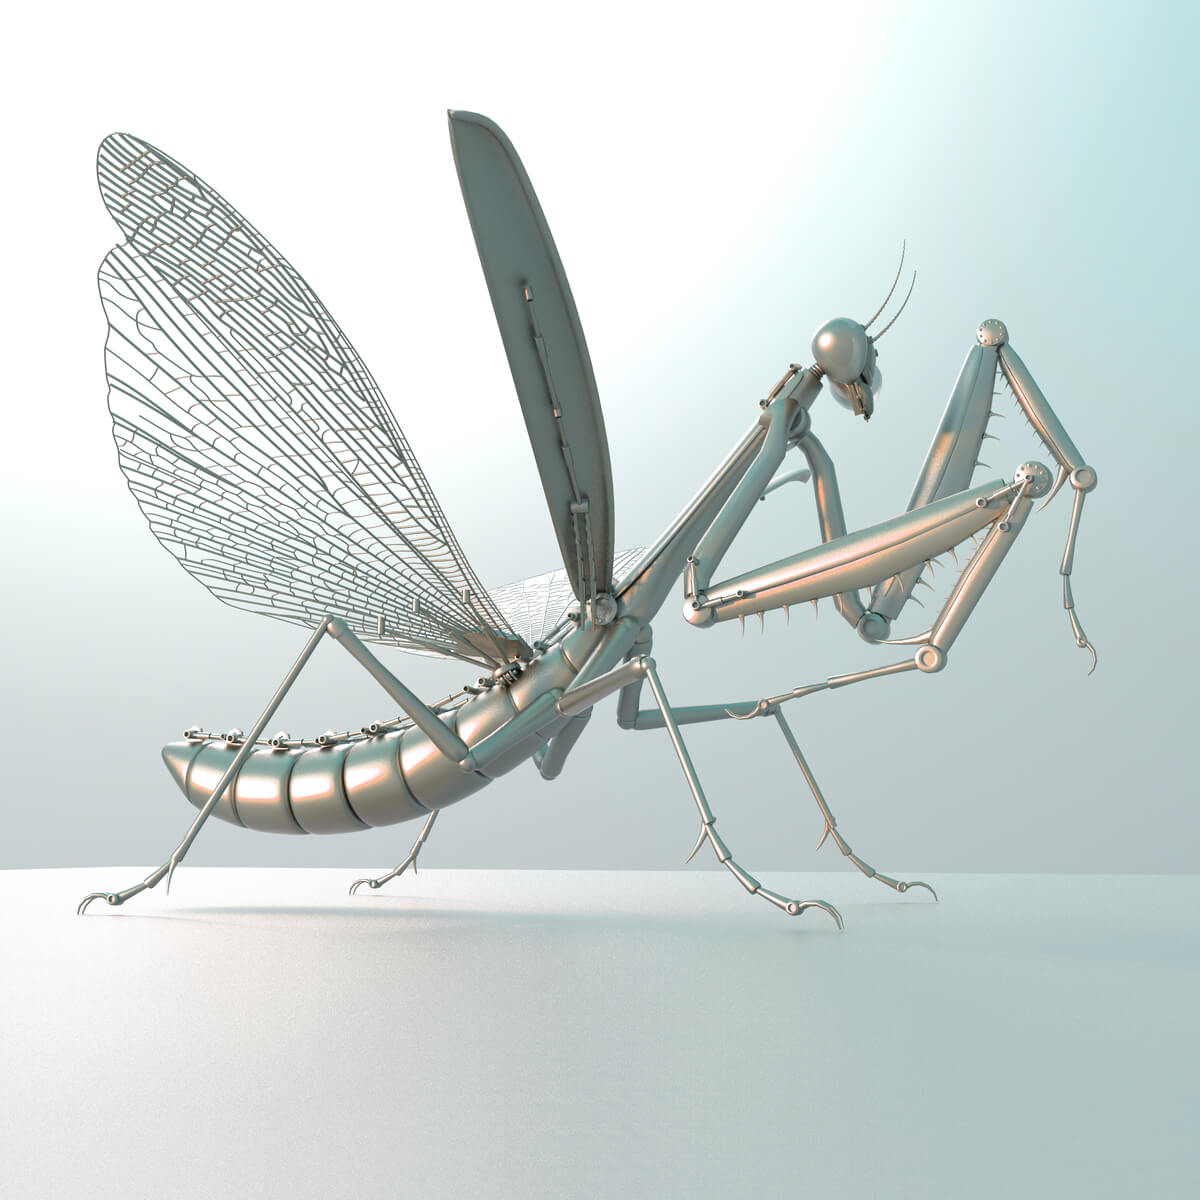 Una mantis robot.